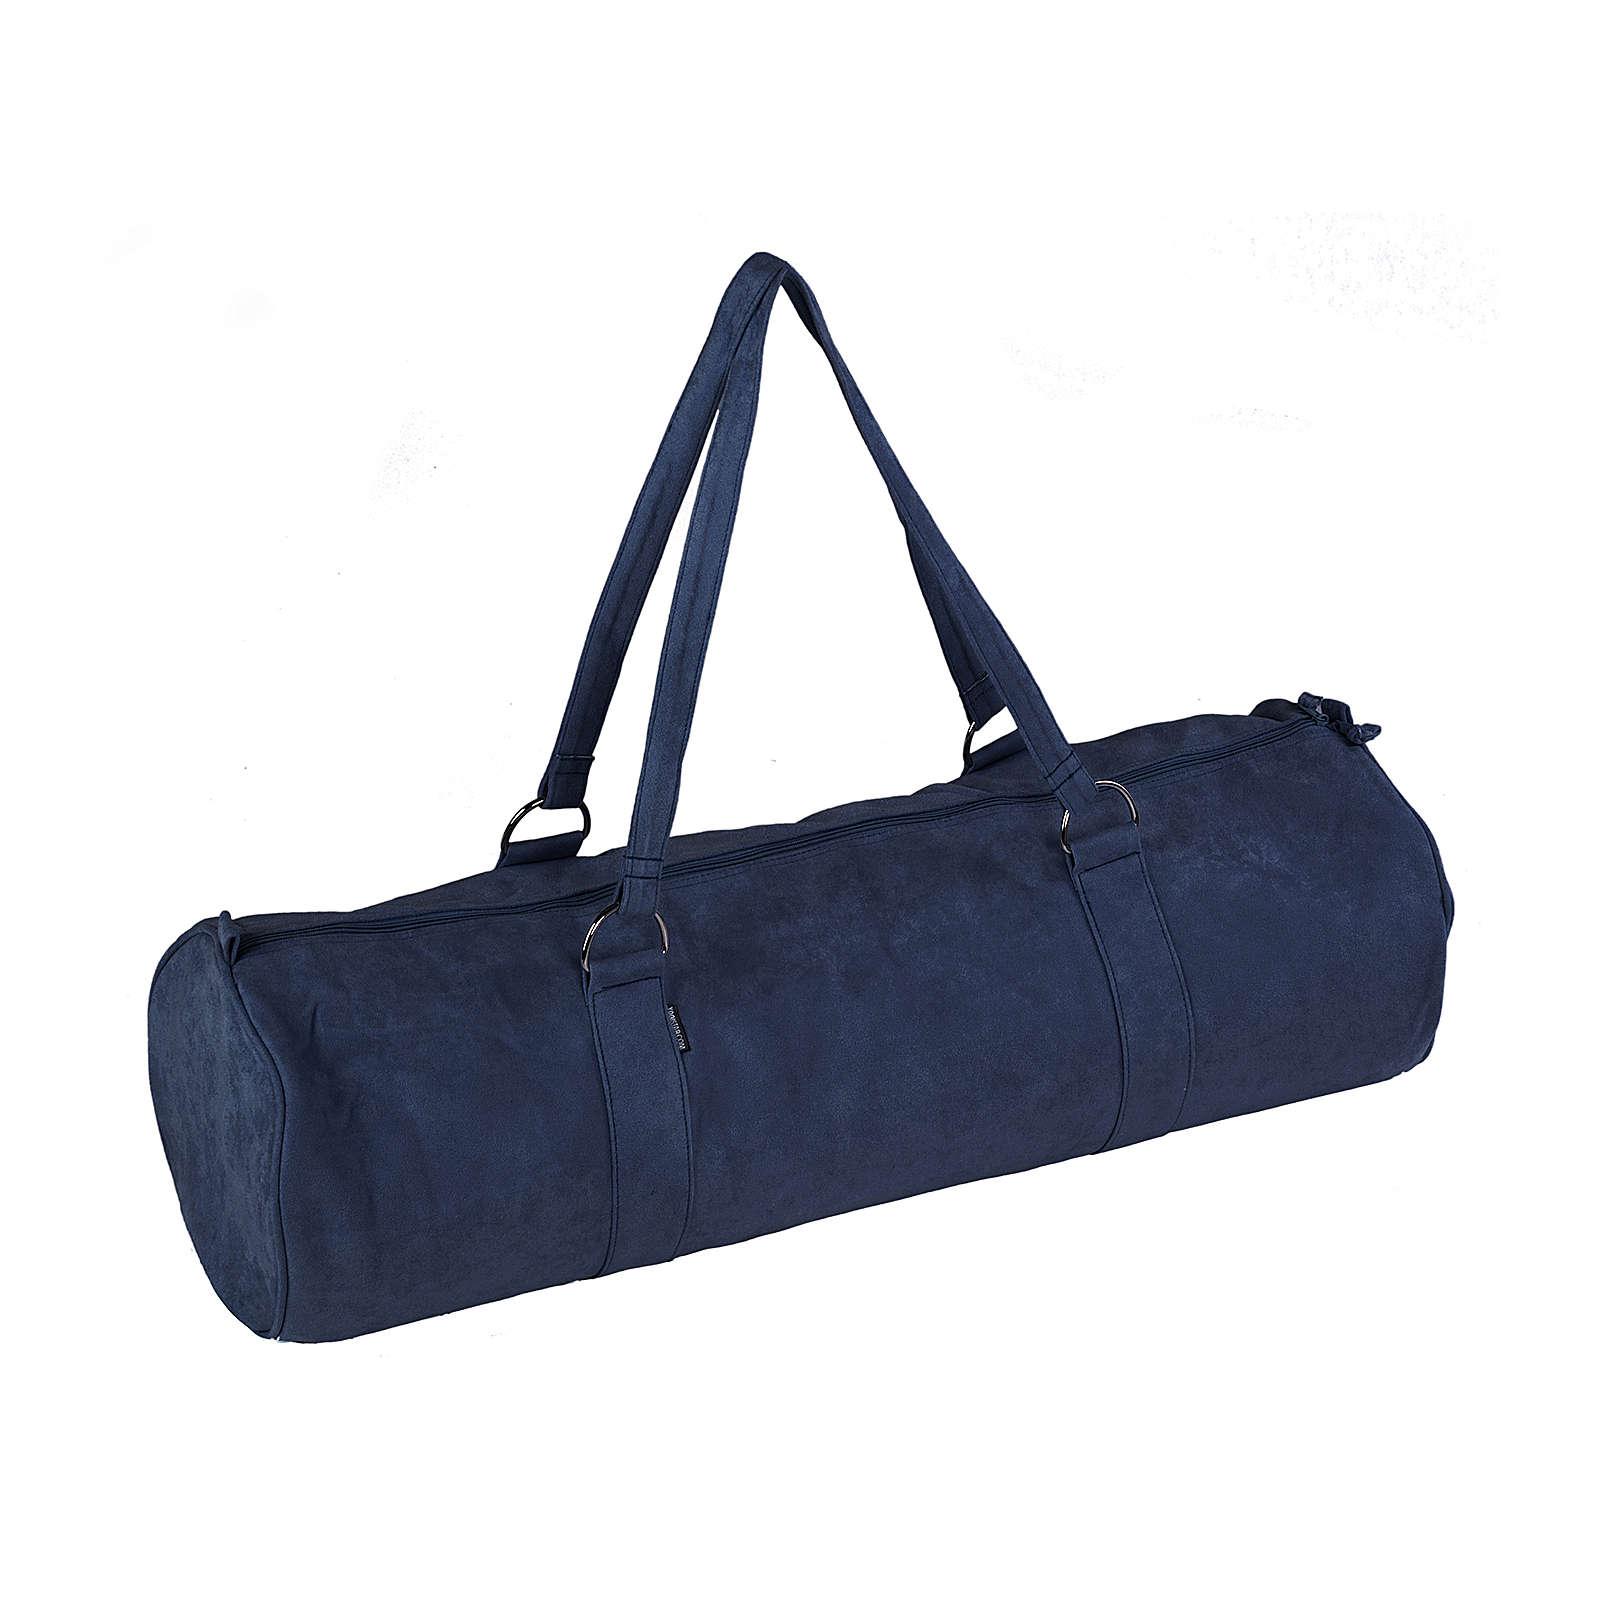 Yogistar Yogatasche style - zip extra big velour 80 cm dunkelblau